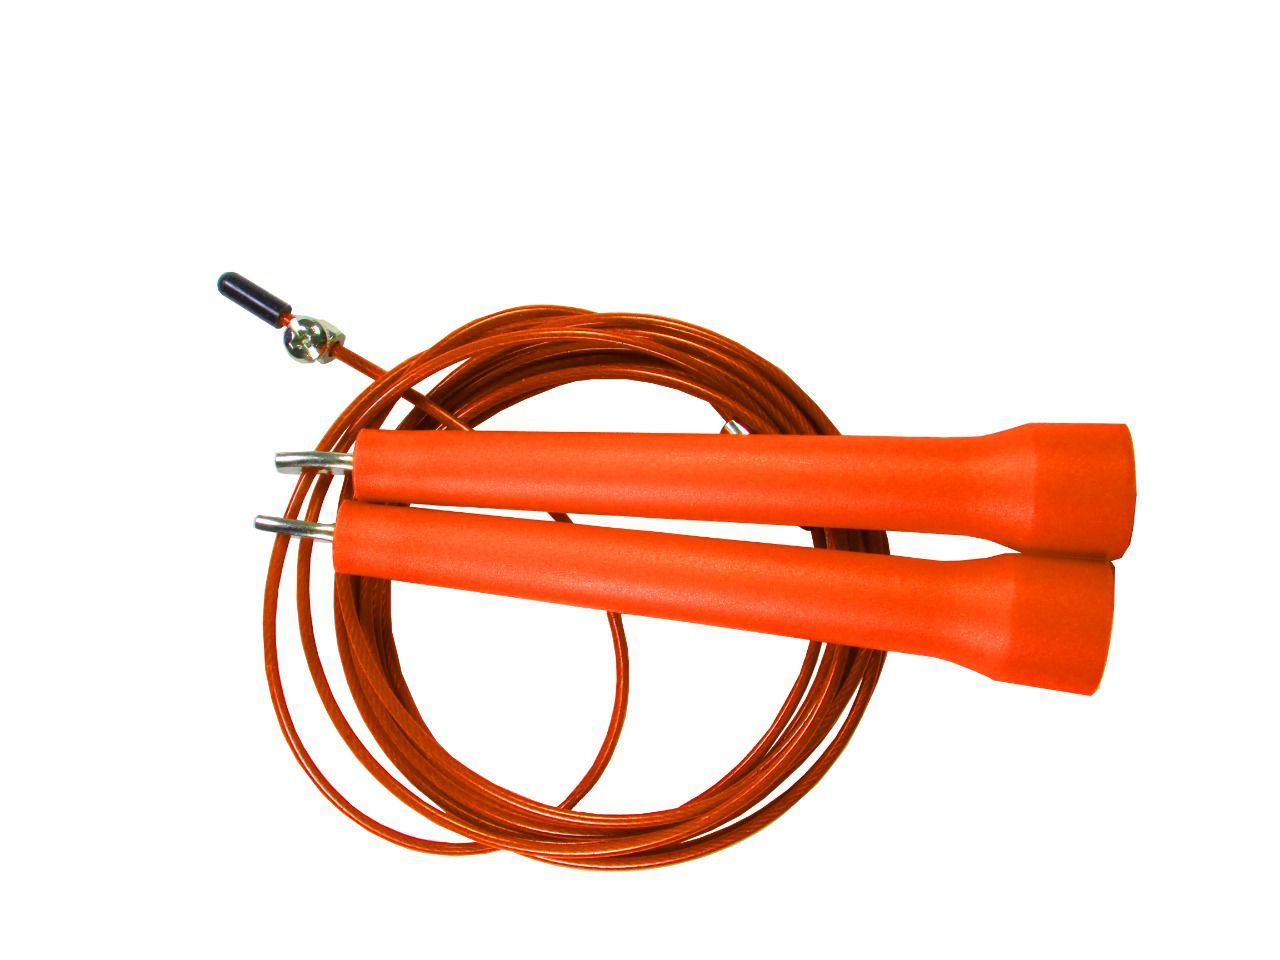 Corda De Pular Speed Rope 1 Rolamento / PVC Laranja